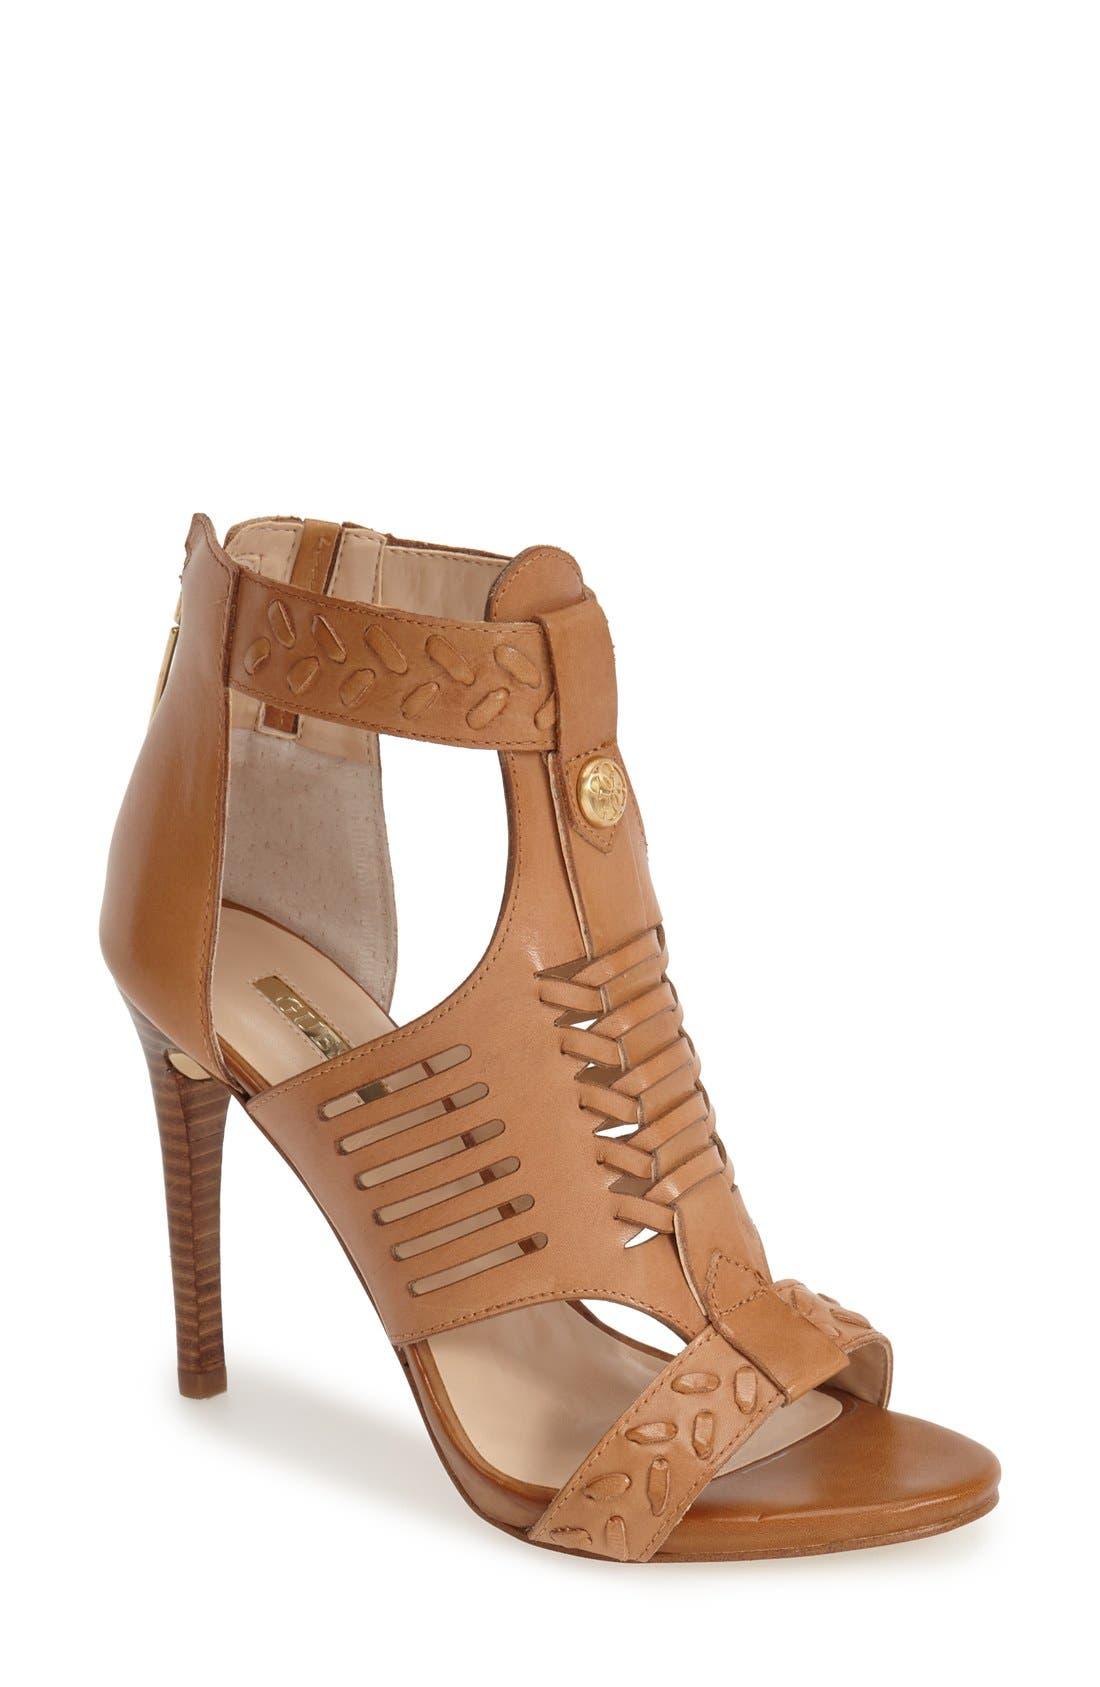 Alternate Image 1 Selected - GUESS 'Corale' Huarache Sandal (Women)